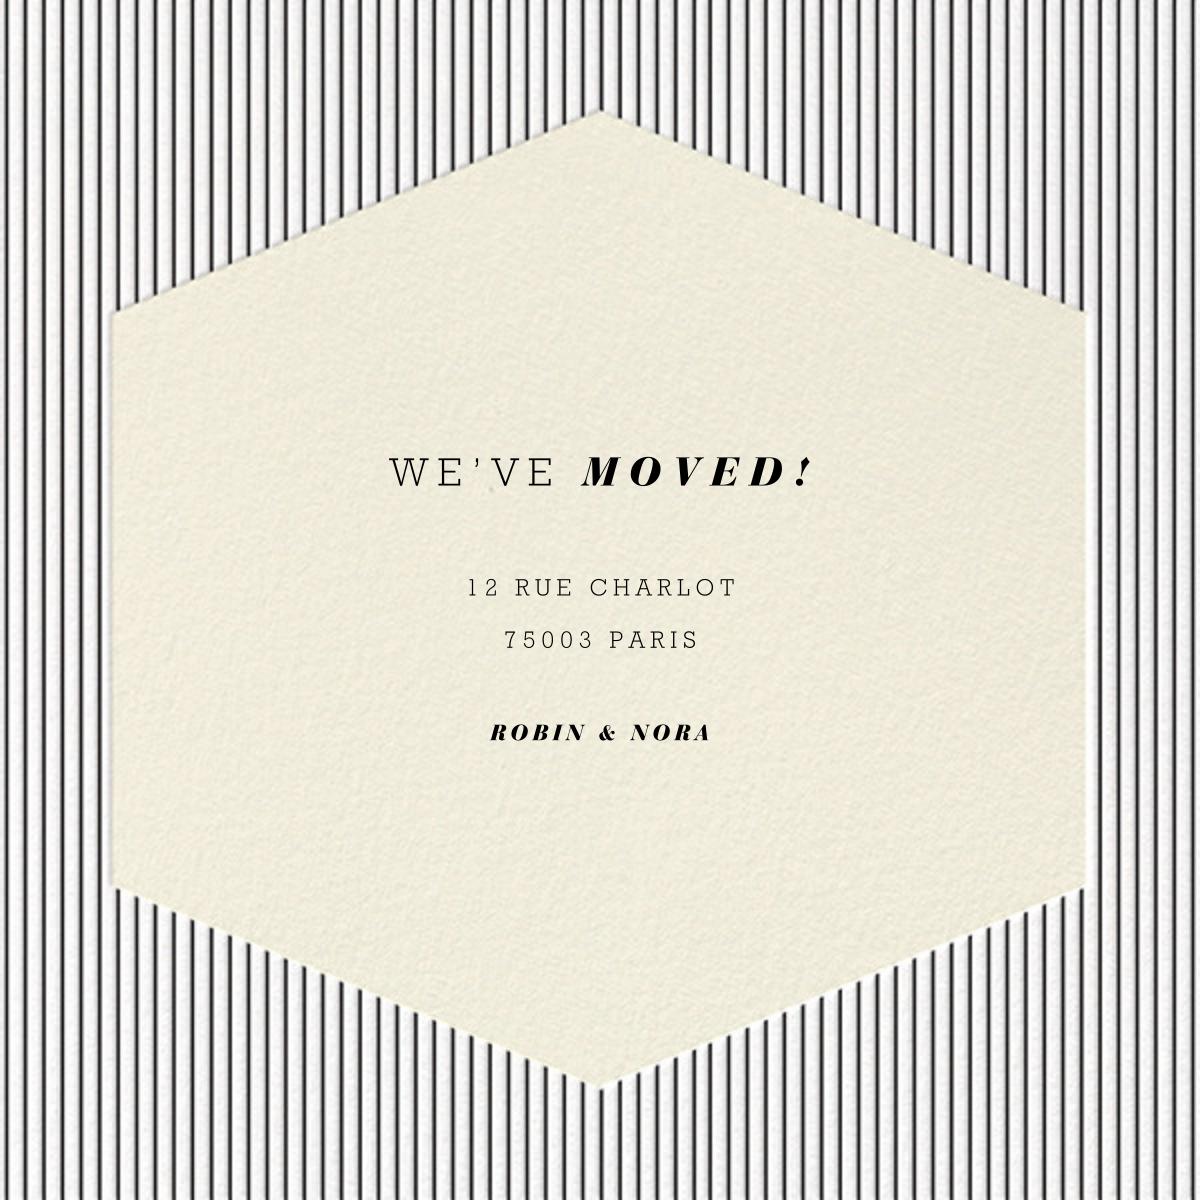 Plaza Square - Cream - Paperless Post - Moving